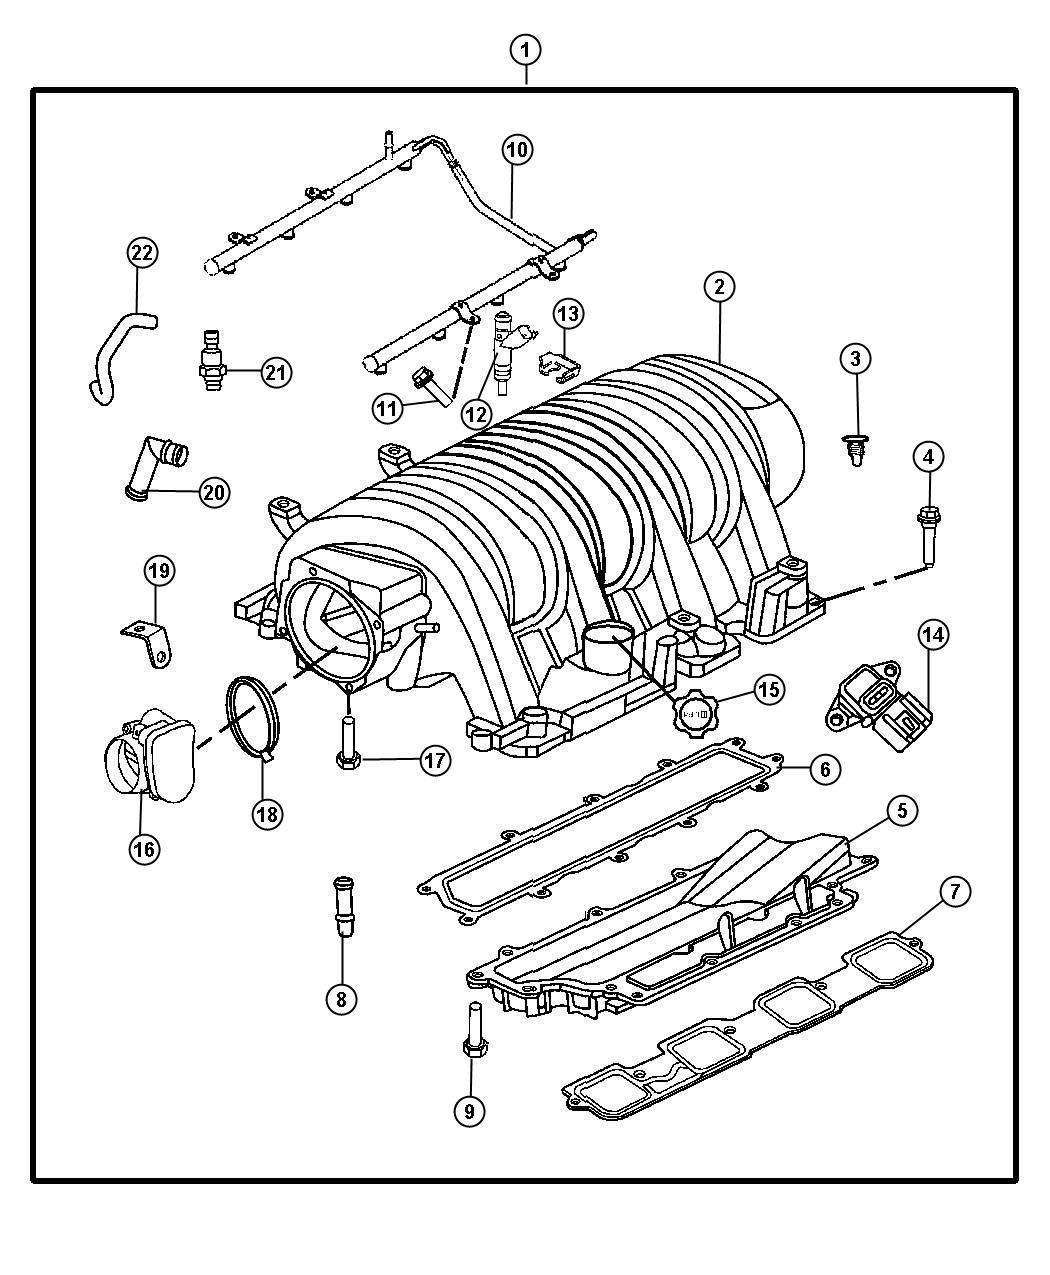 Chrysler 300 Bolt Screw Hex Flange Head Trim M6x1